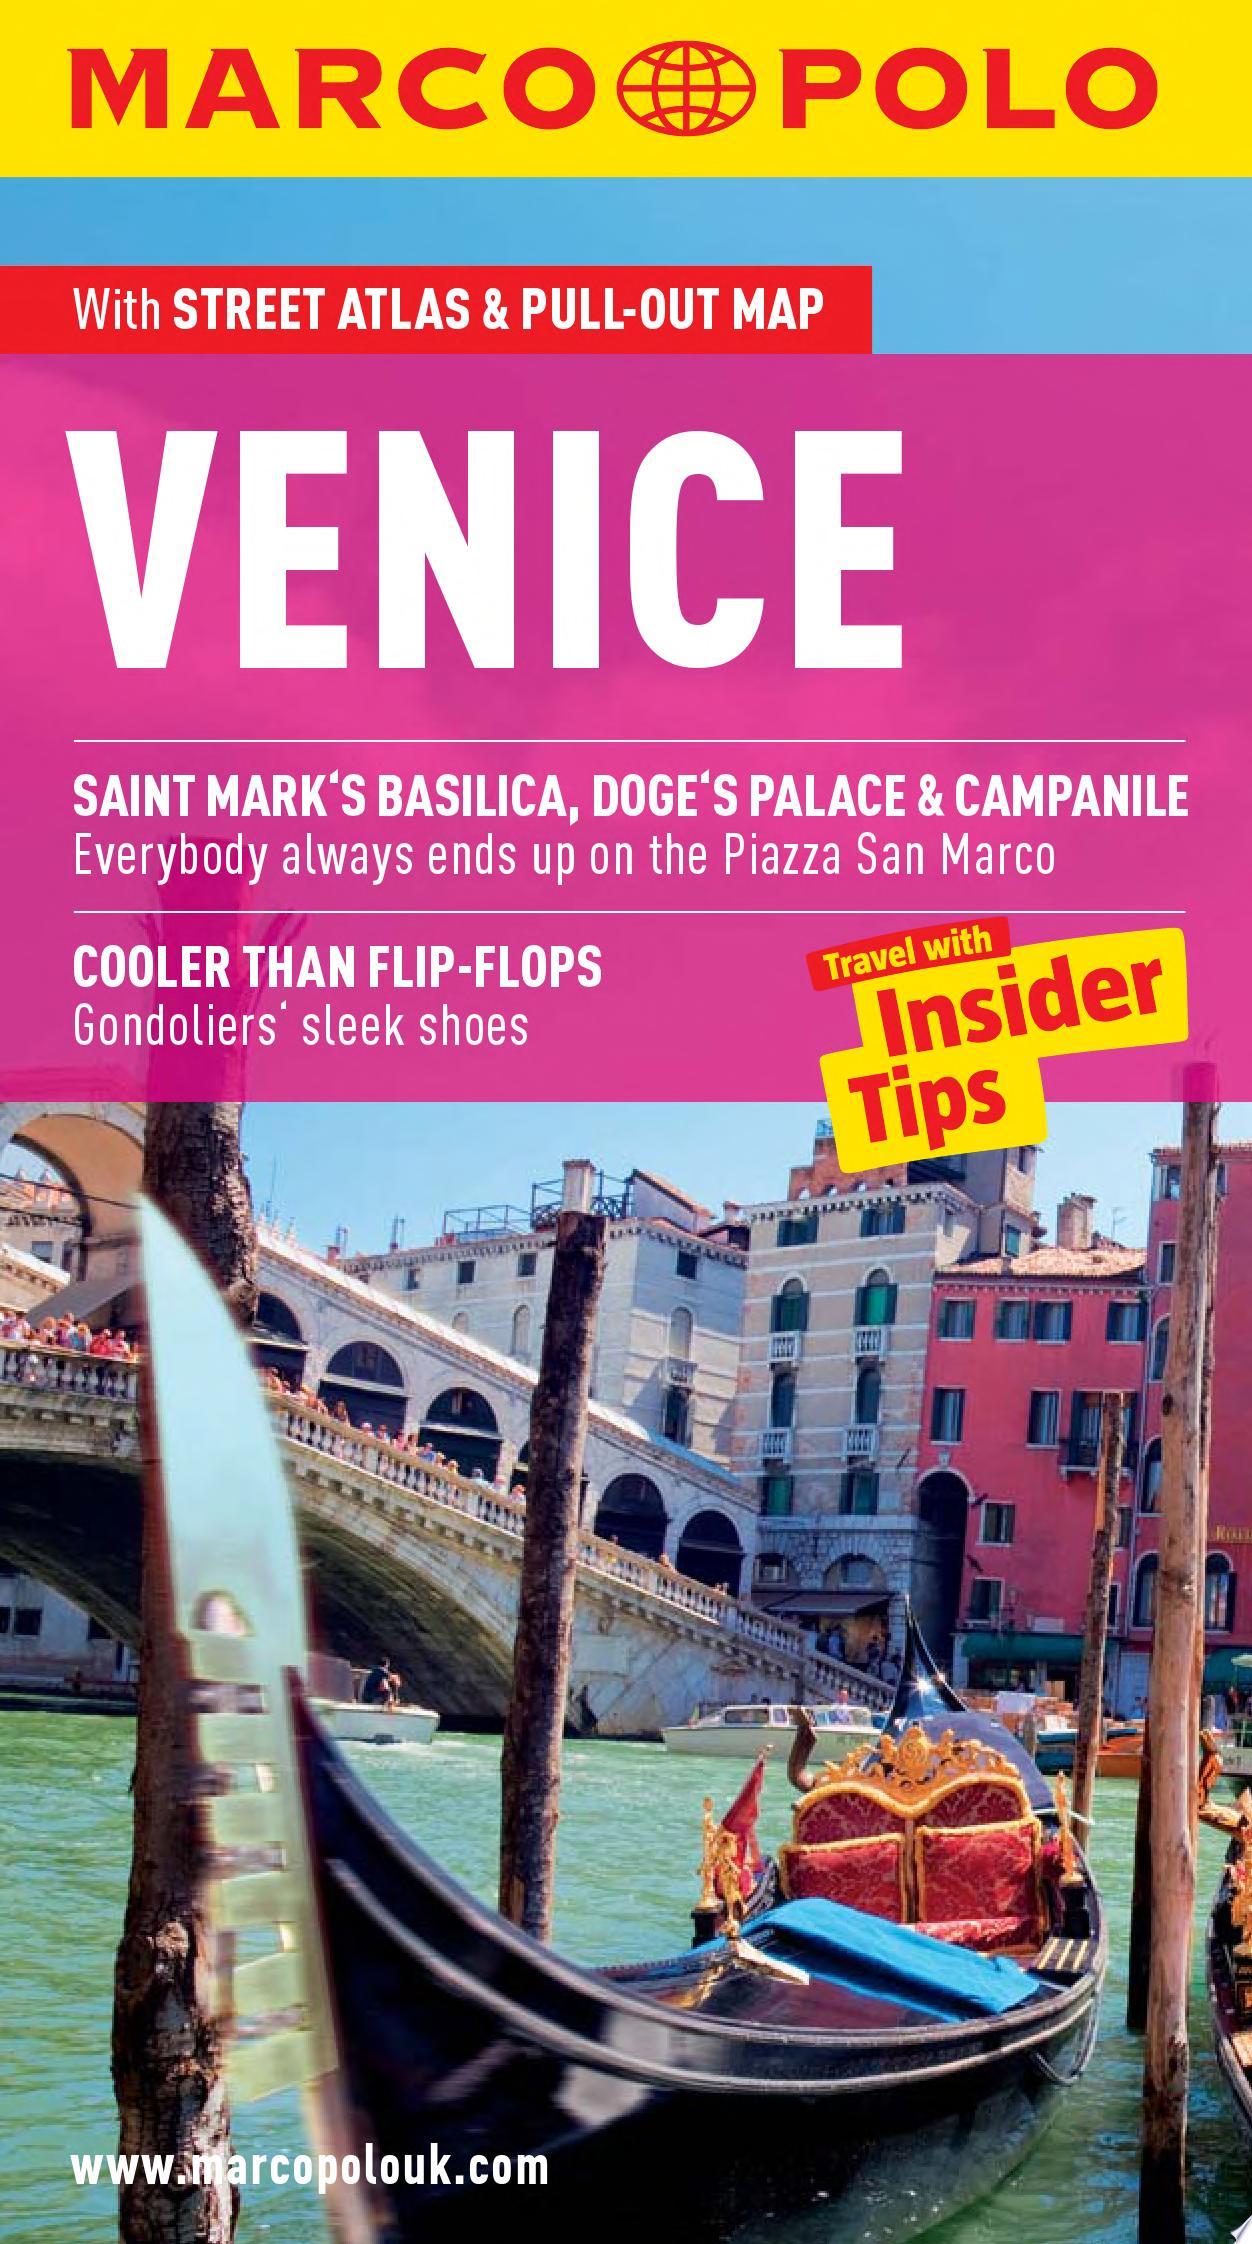 Venice Marco Polo Guide